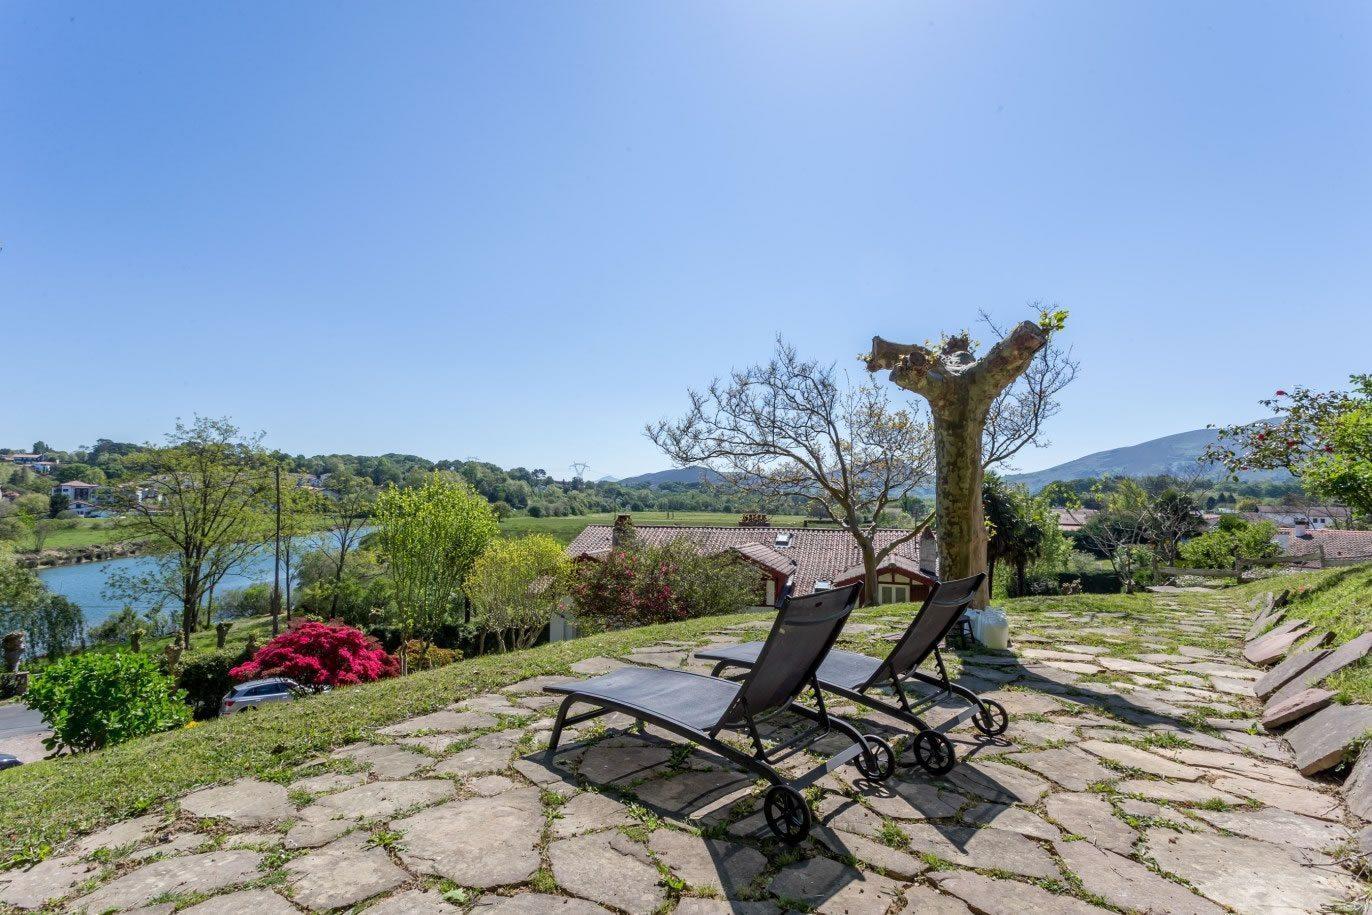 ferme-basque-renovee-a-vendre-ciboure-vue-campagne-riviere-cheminees-parking